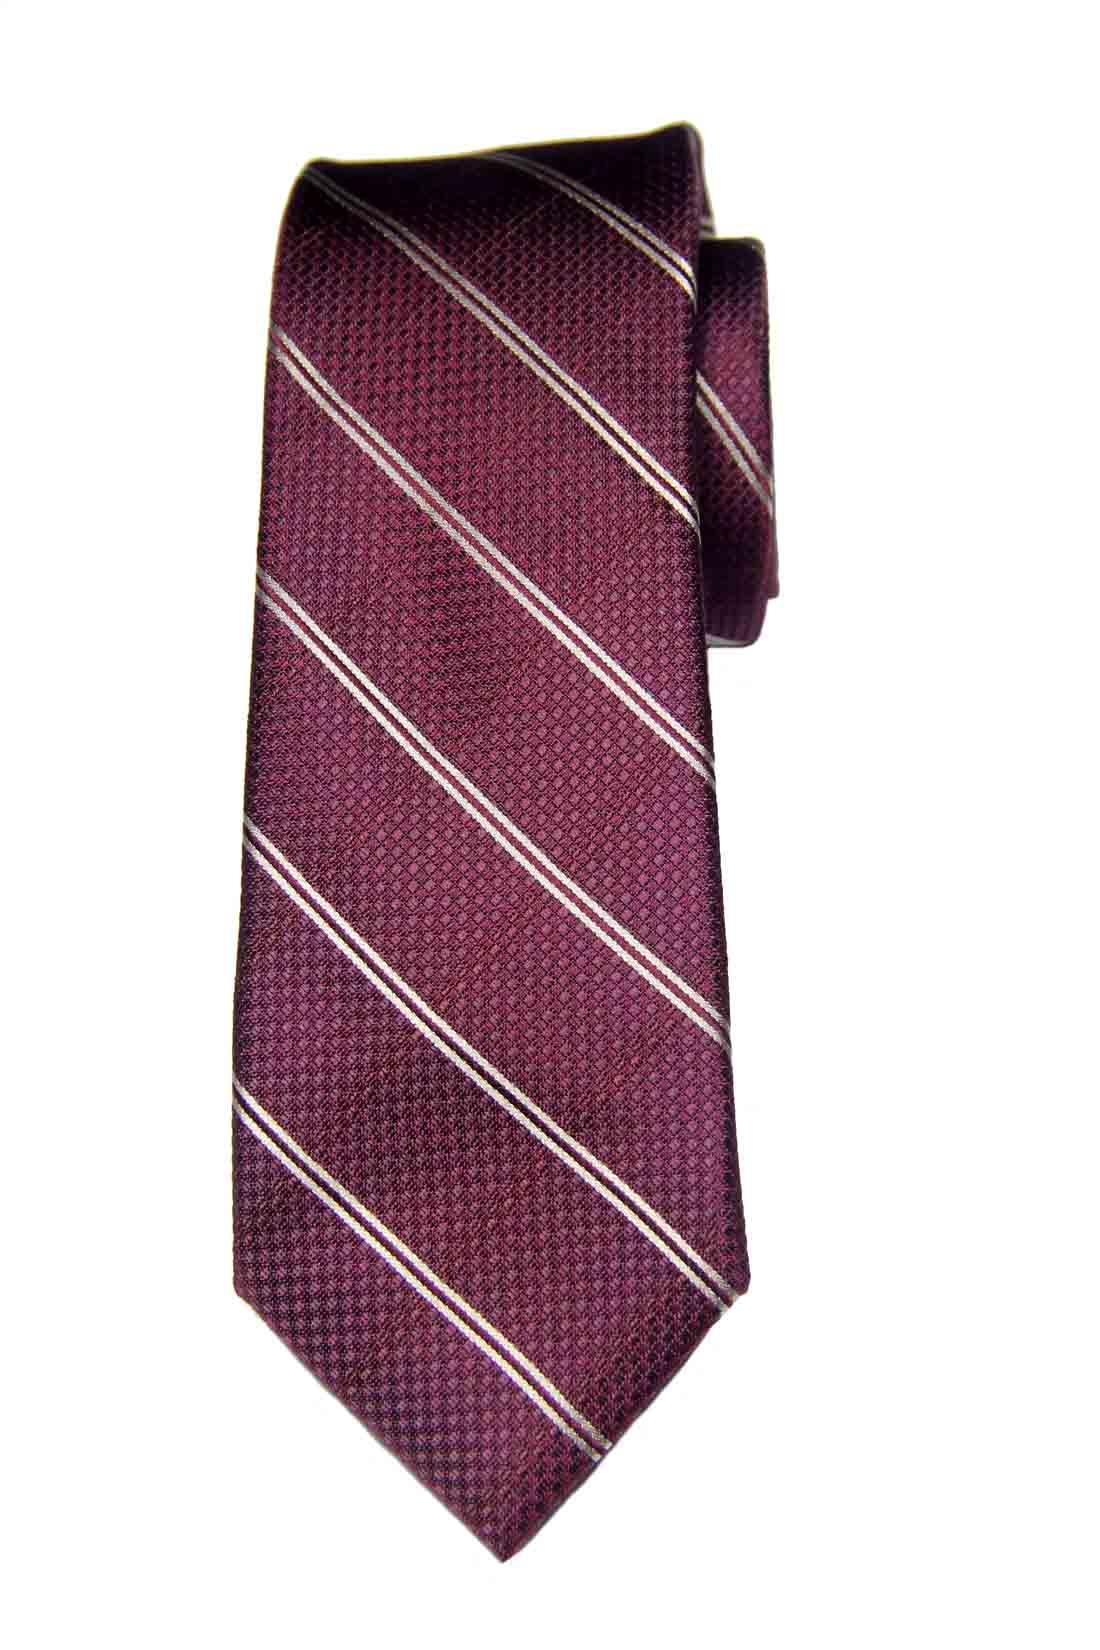 Jos A Bank Silk Tie Burgundy White Striped Men's